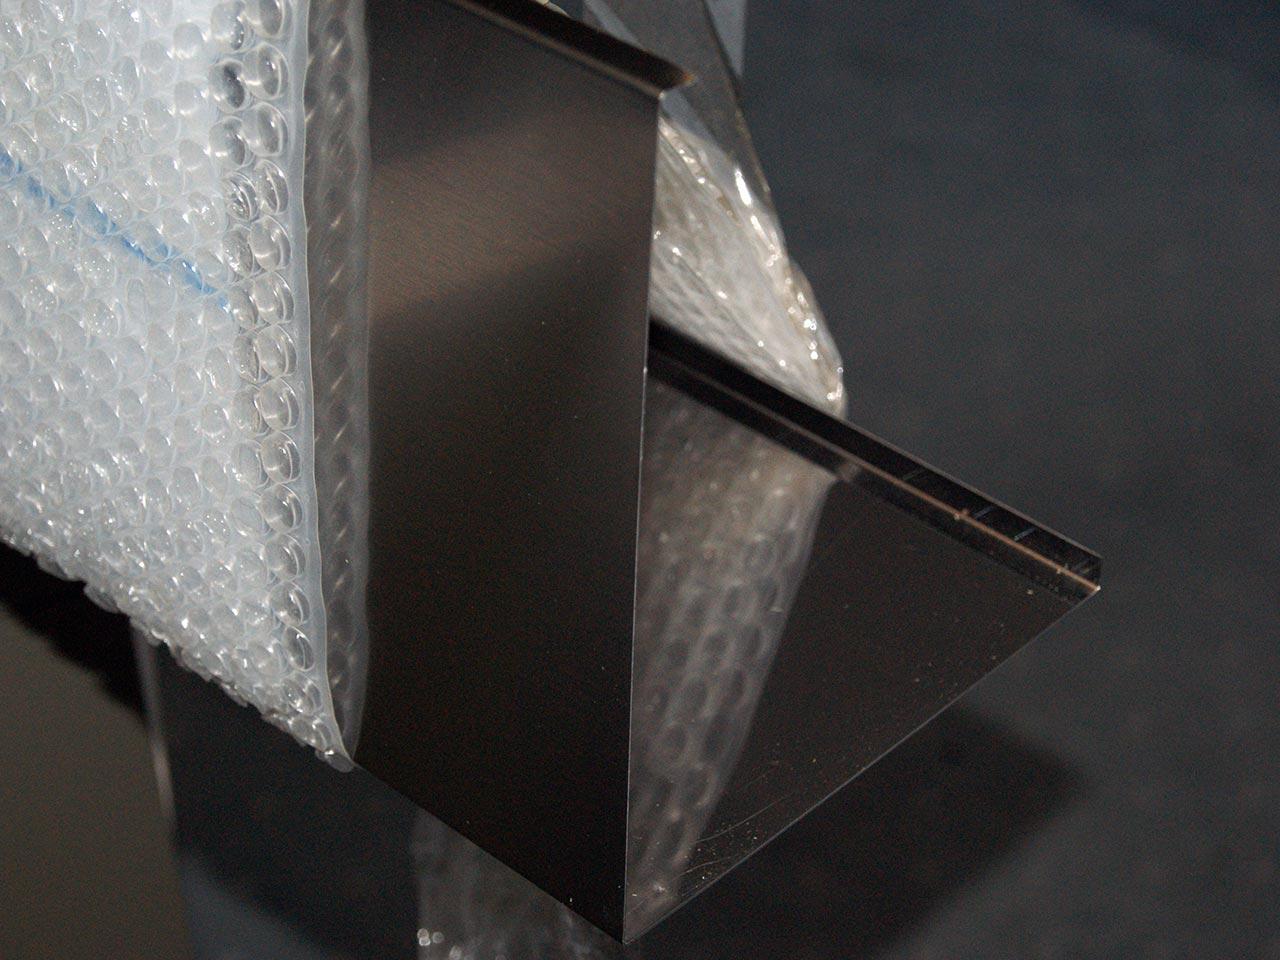 200 cm l form dunsthaube verlangerung dunstabzug for Abluftrohr dunstabzug